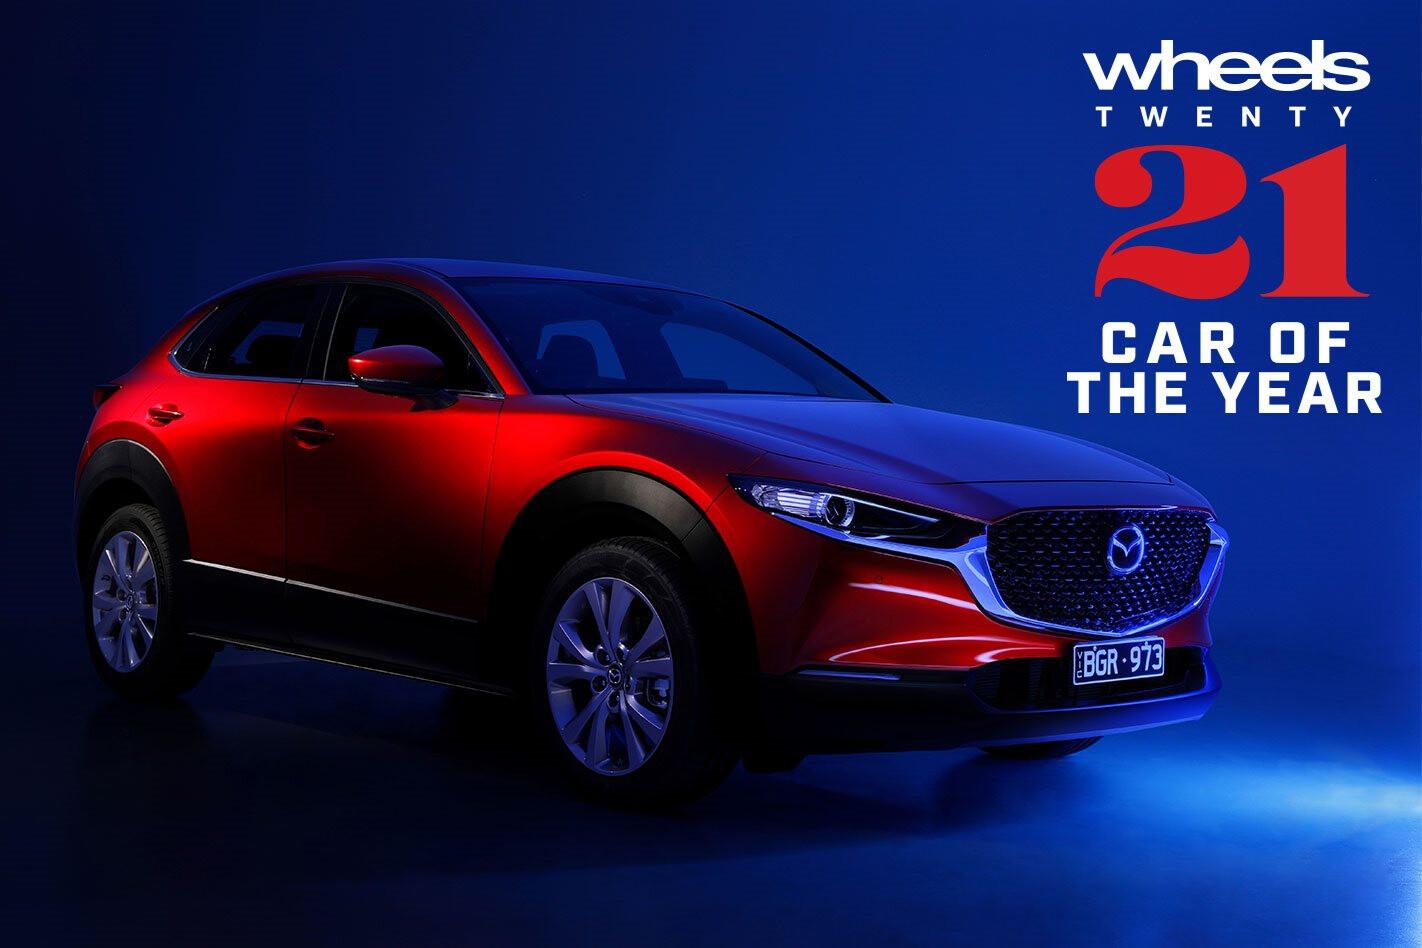 2021 Wheels Car of the Year winner Mazda CX-30